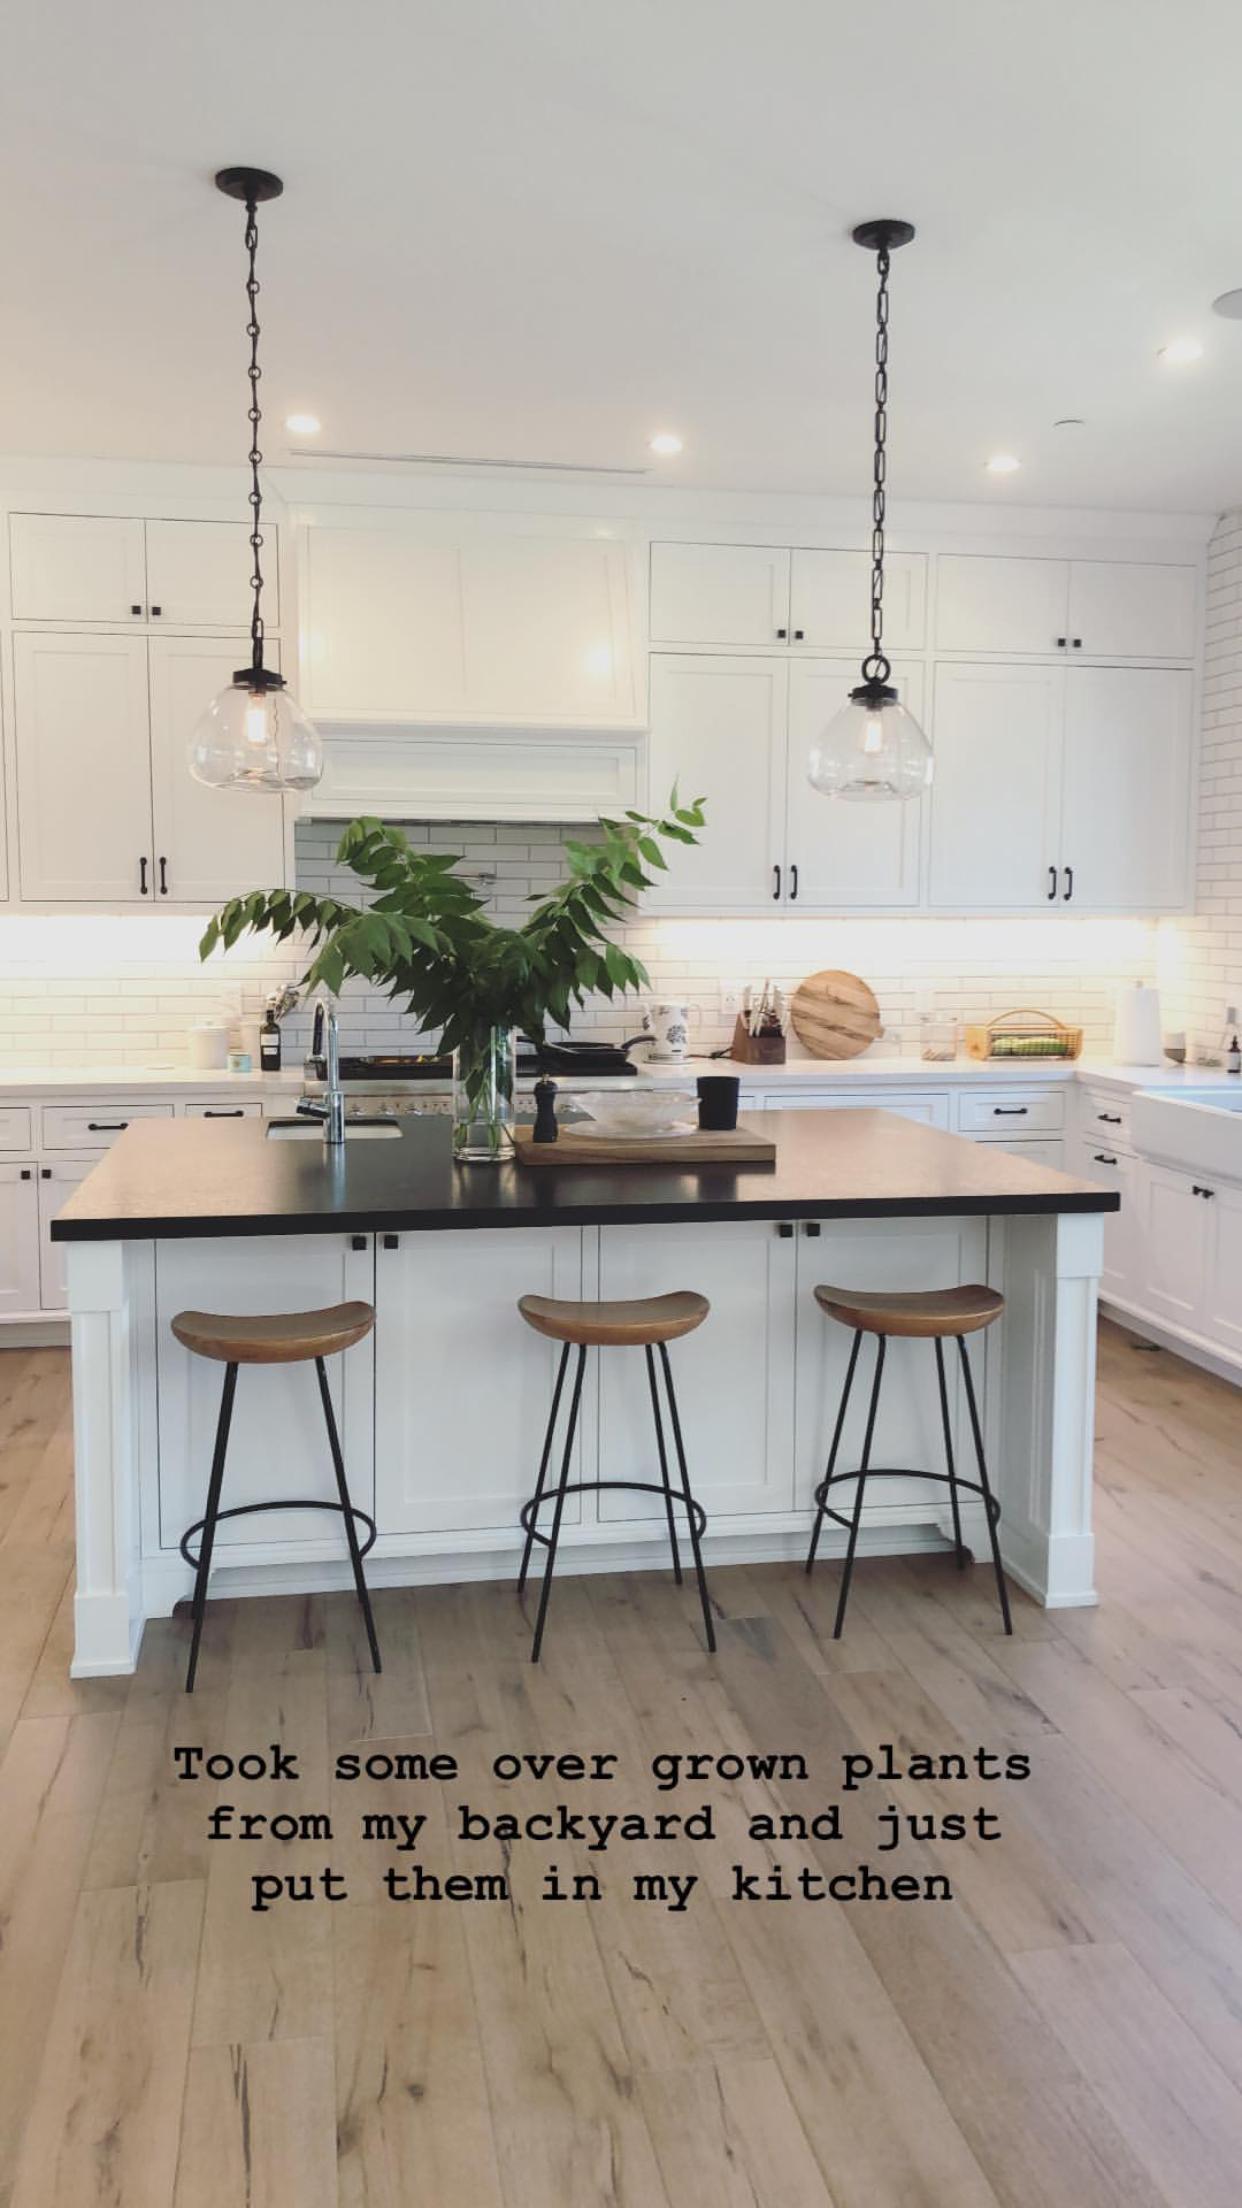 Interiordesignideasbedroom Interiordesignideaslivingroom Interiordesignideas In 2020 Home Decor Kitchen Interior Design Kitchen Small Kitchen Interior Design Modern